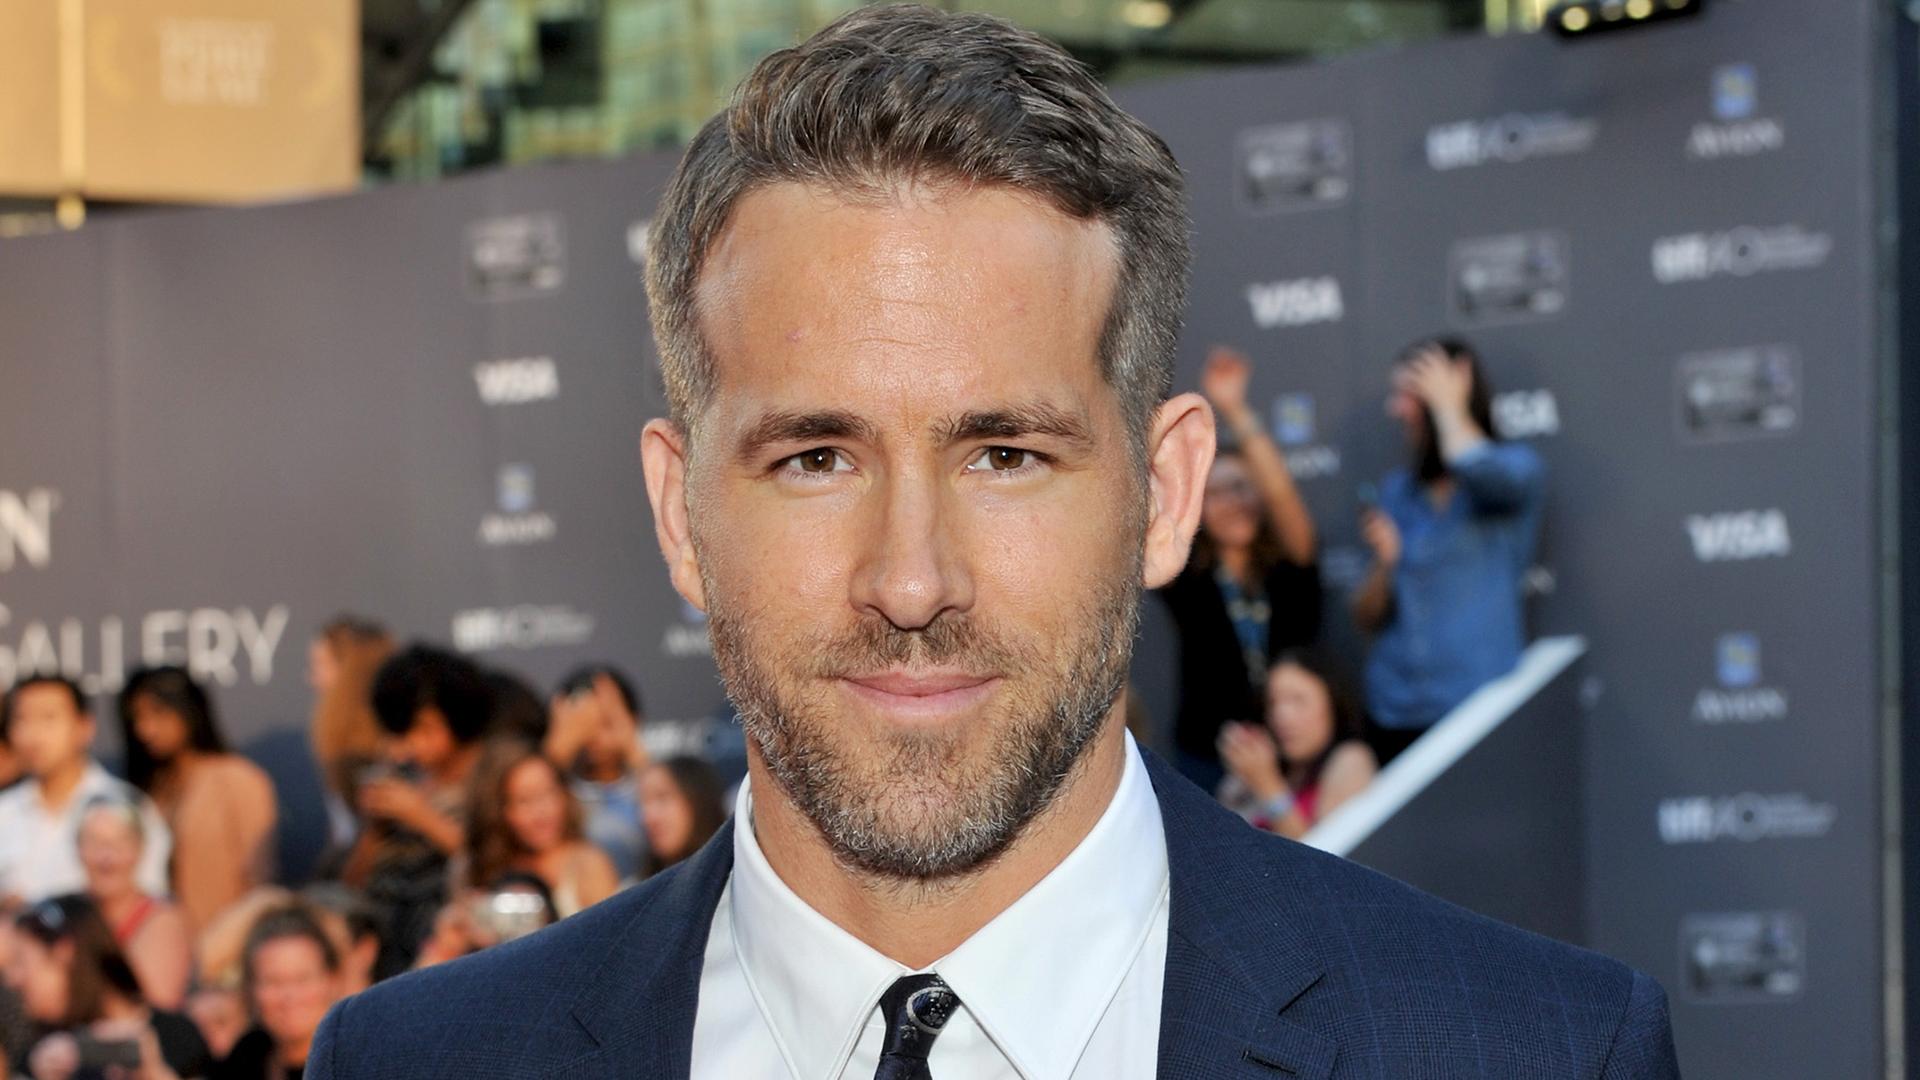 Ryan Reynolds (Photo by Sonia Recchia/Getty Images)